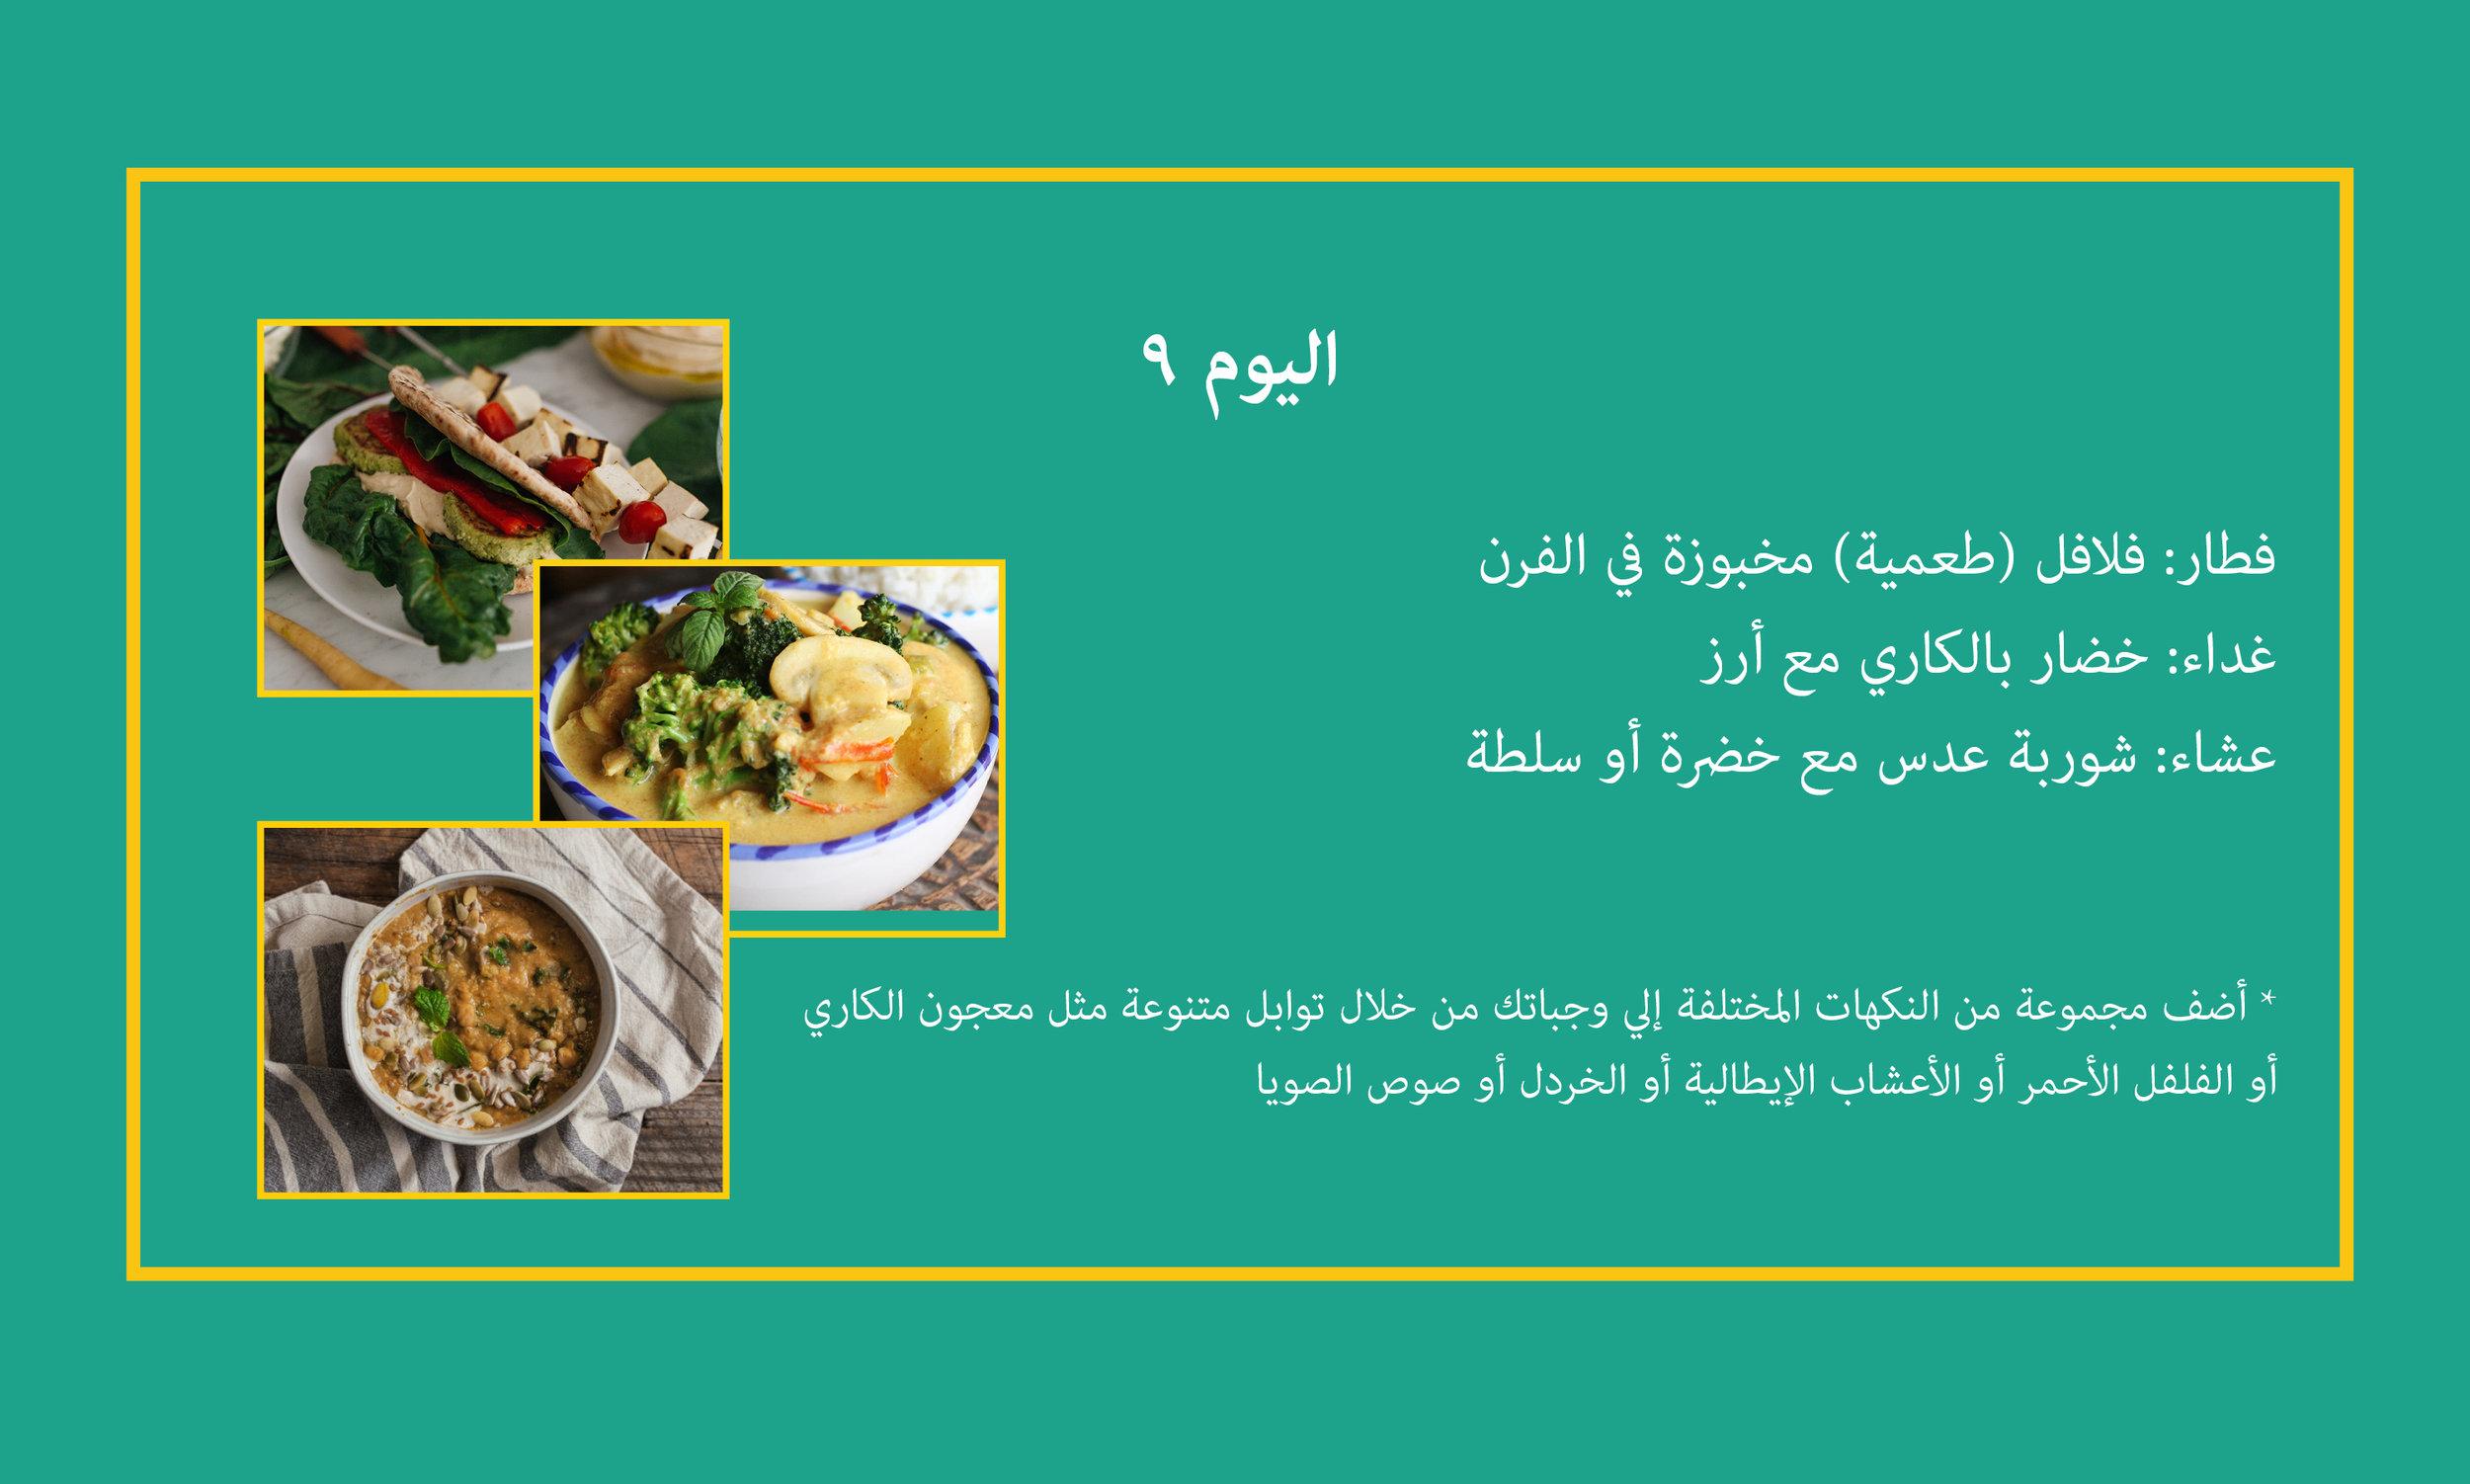 Day 9 Arabic.jpg